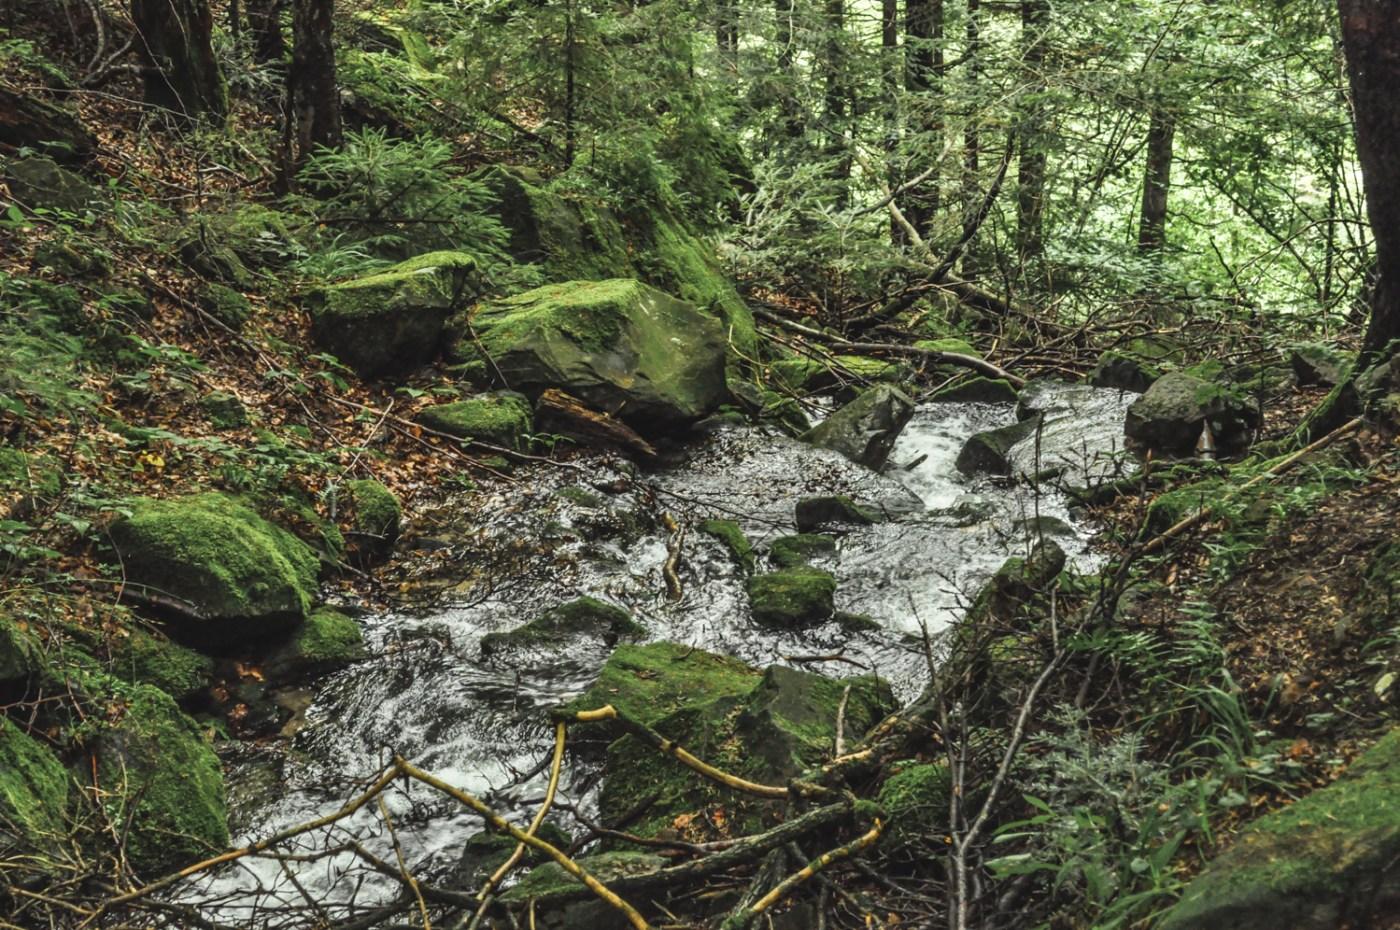 Carpathian mountains in Ukraine